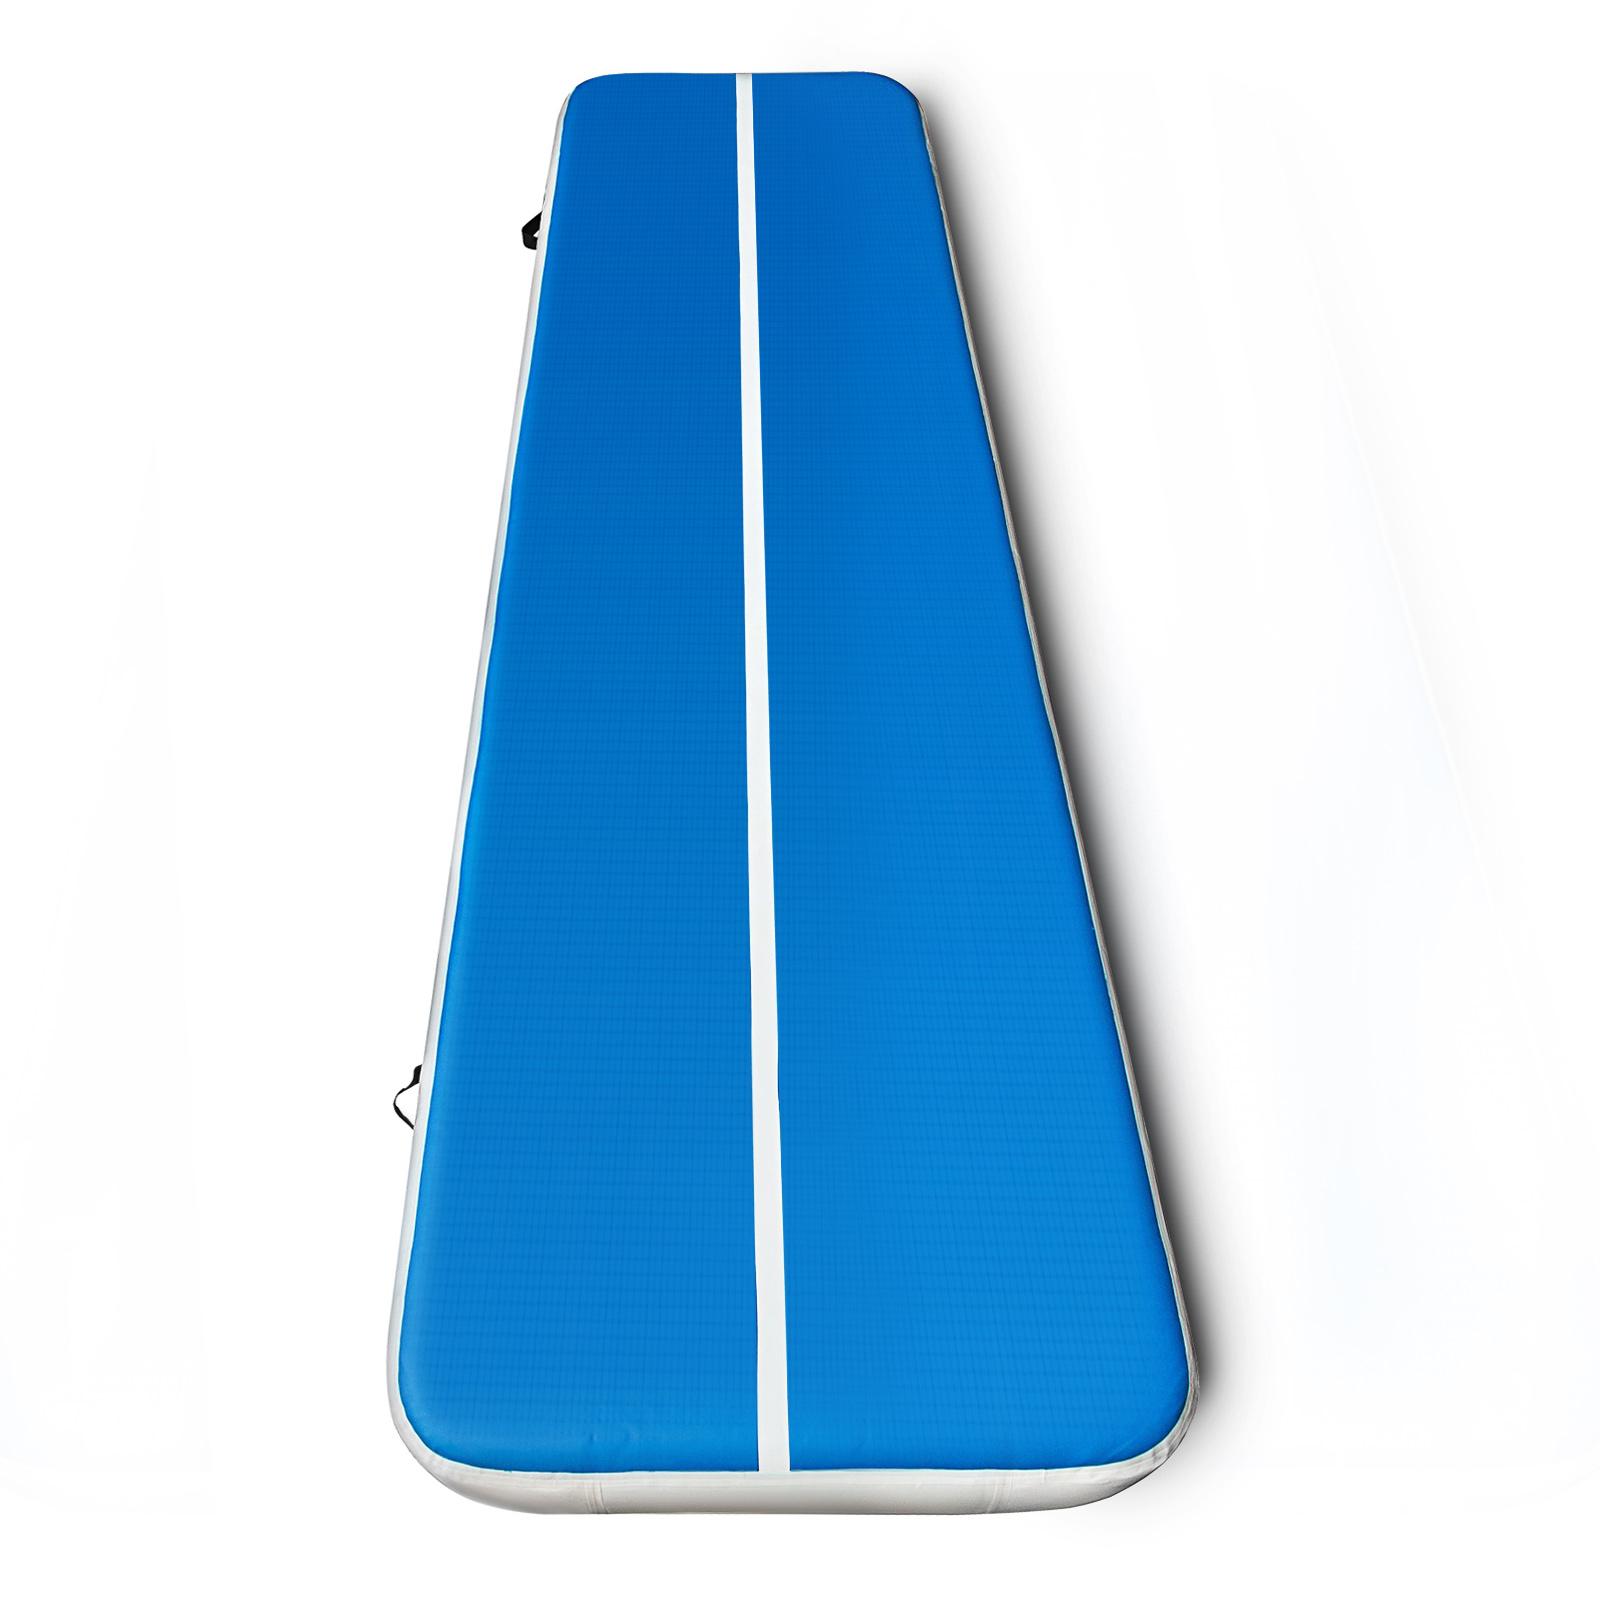 inflatable gymnastics mat air track floor home tumbling. Black Bedroom Furniture Sets. Home Design Ideas